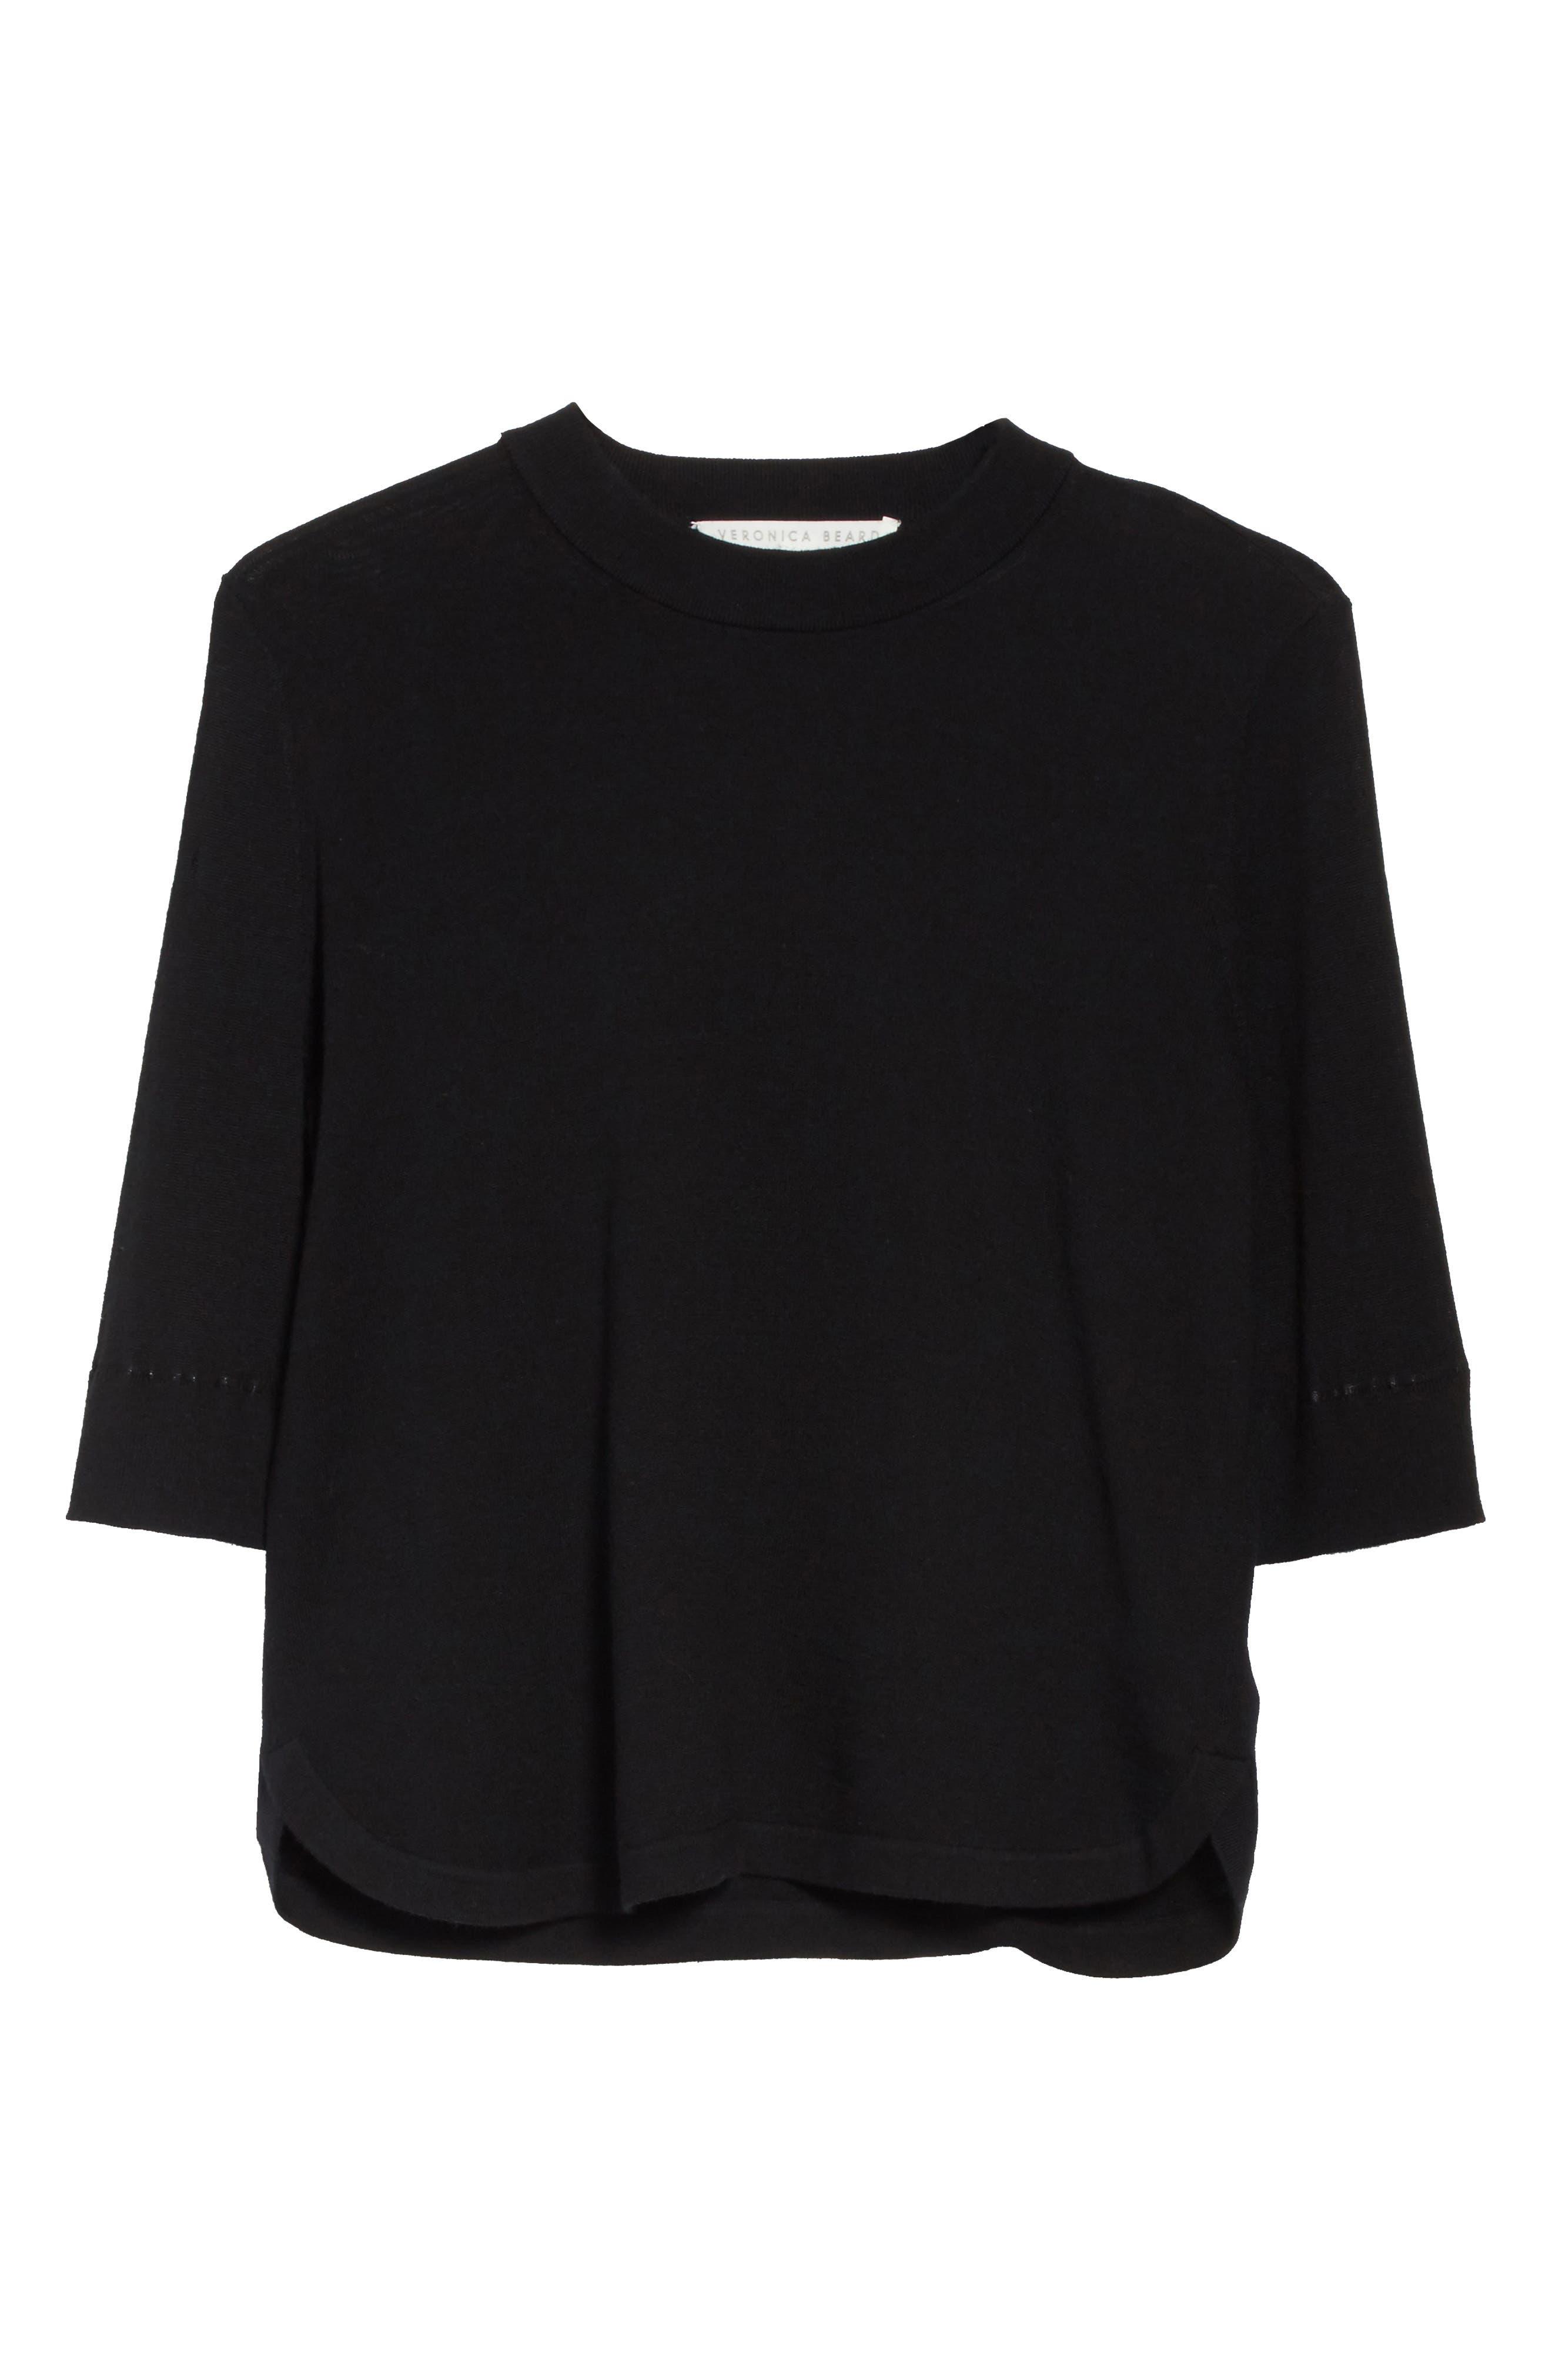 Roscoe Mixed Media Sweater,                             Alternate thumbnail 6, color,                             Black